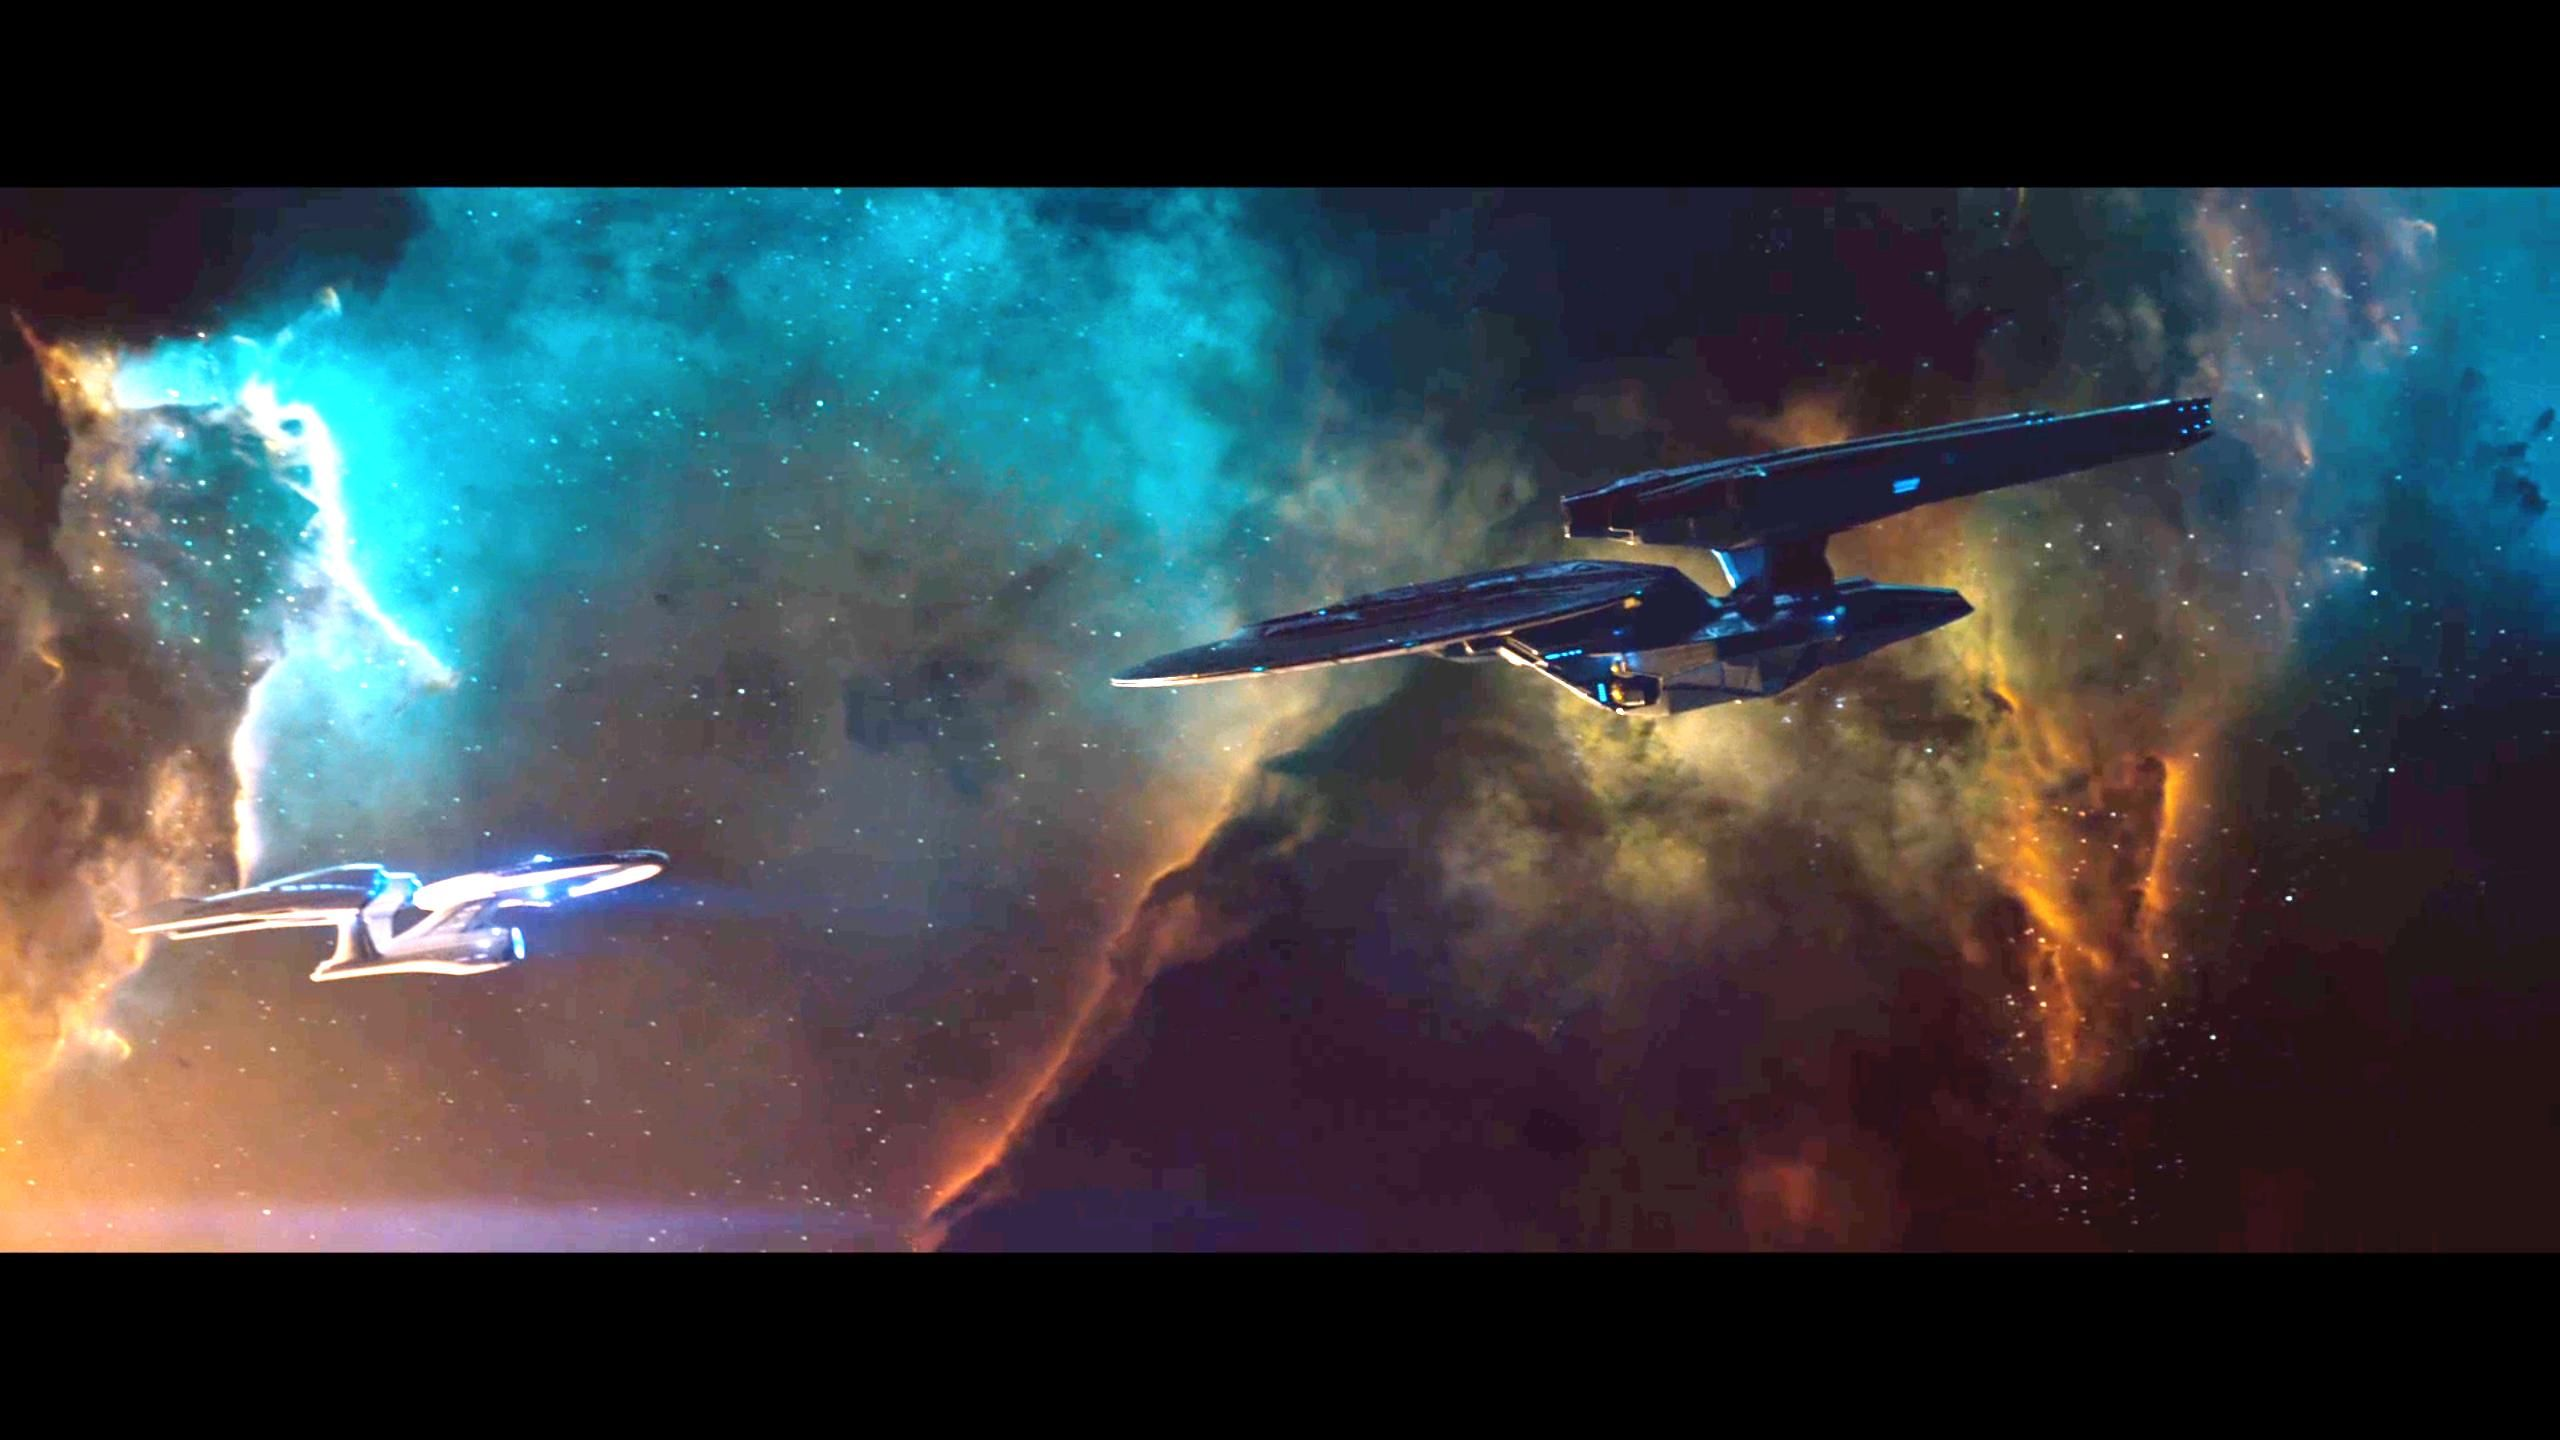 Movie Star Trek Into Darkness Wallpaper Star Trek Wallpaper Star Trek Into Darkness Star Trek Starships